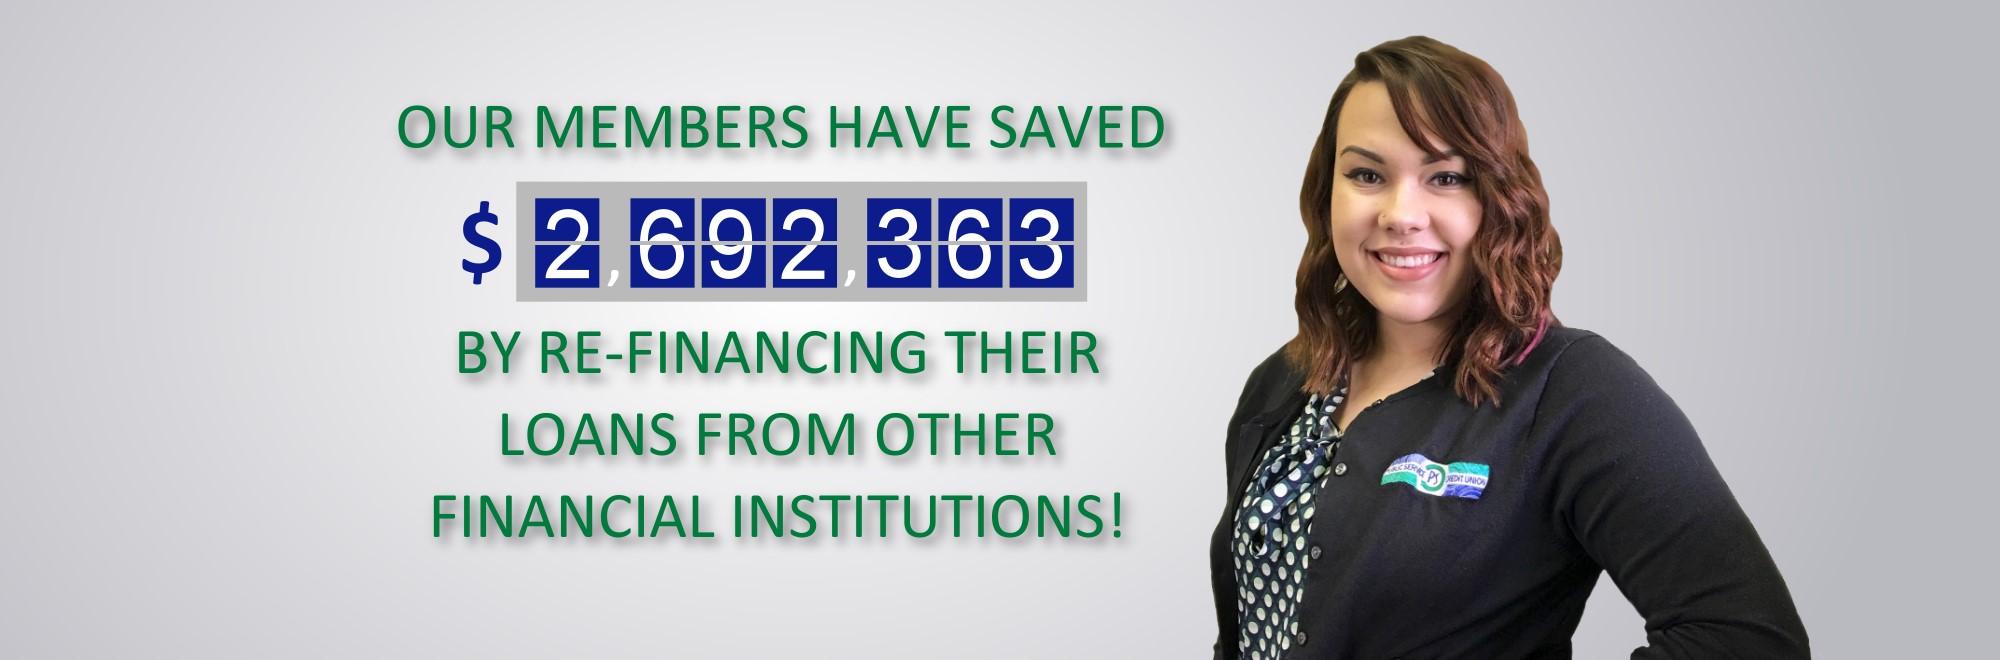 Loan Savings Image